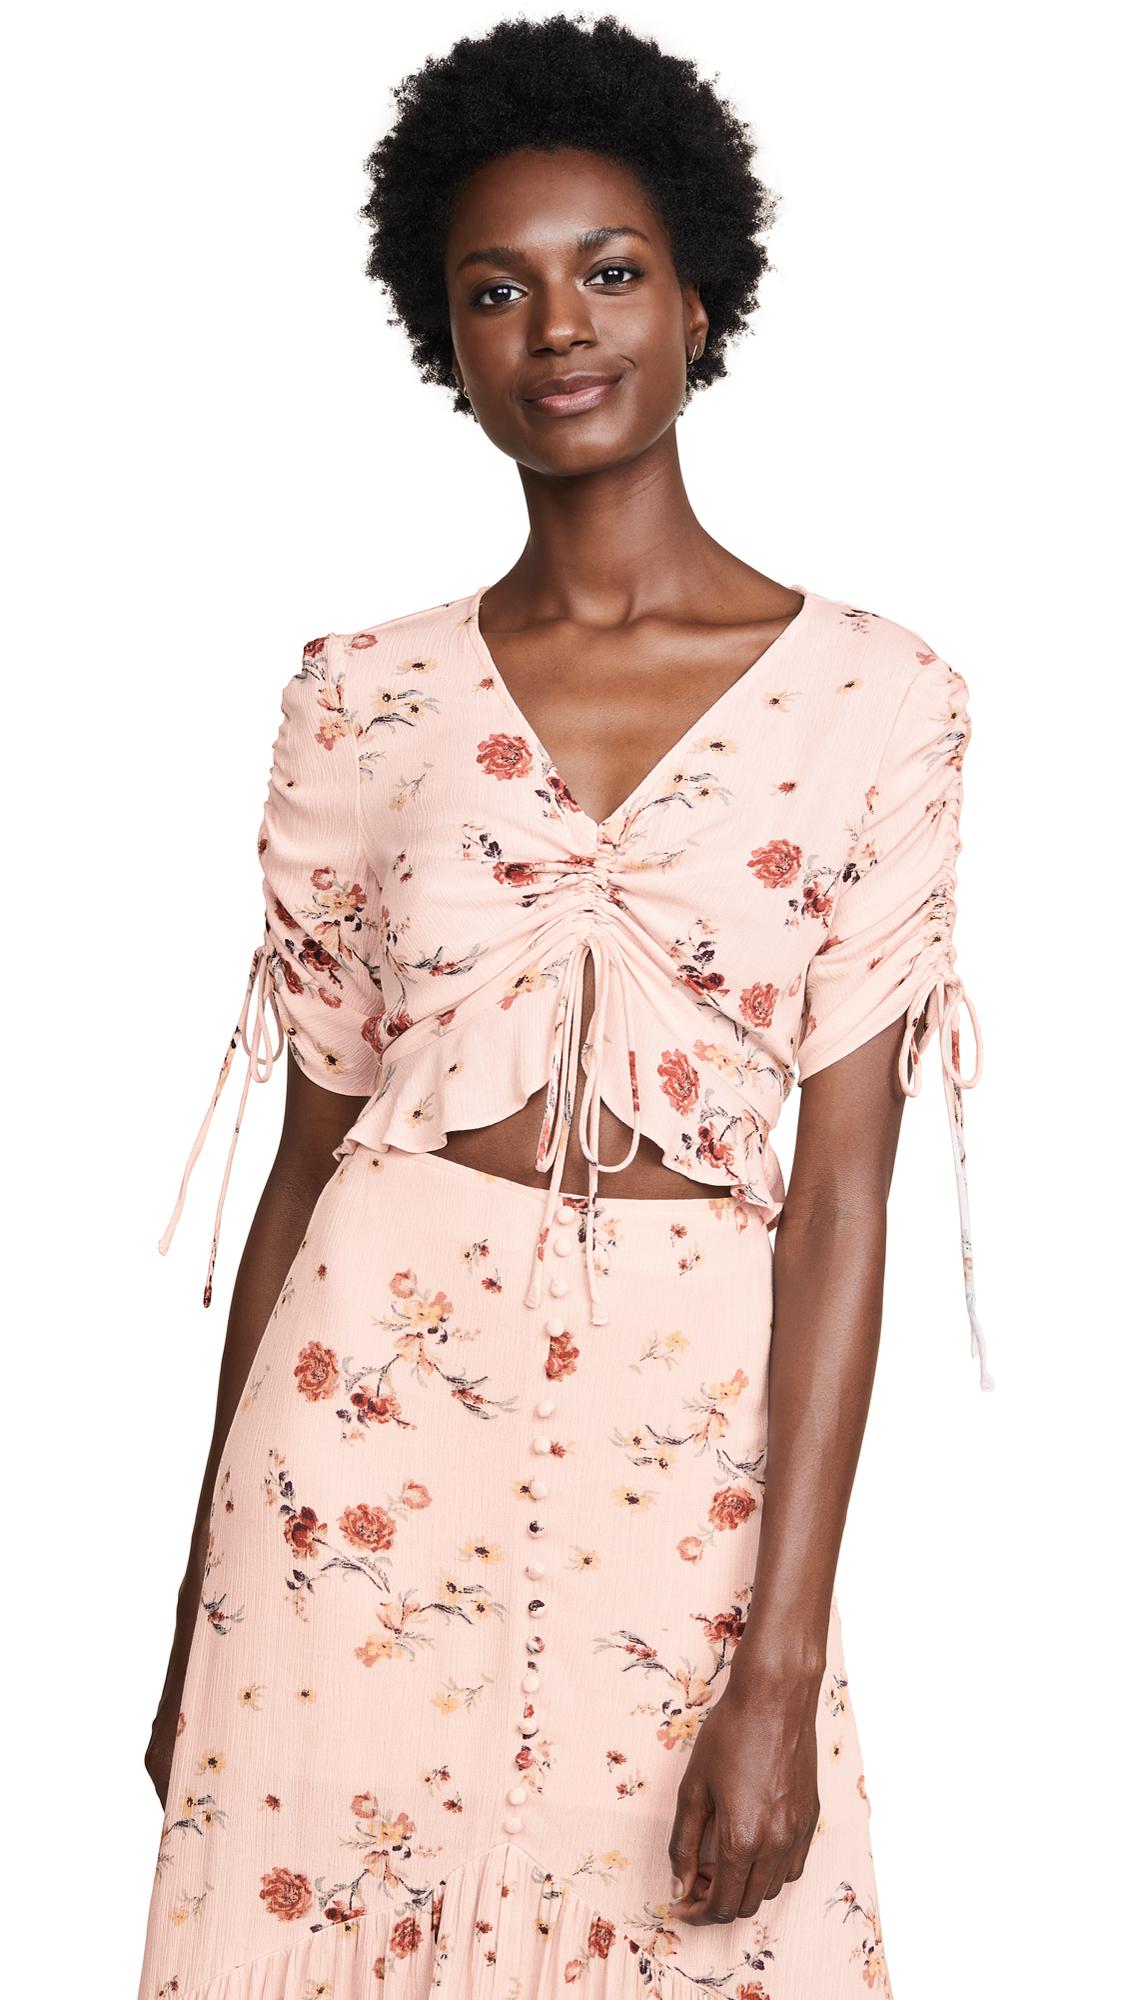 LOST + WANDER Rosa Crop Top in Pink Floral